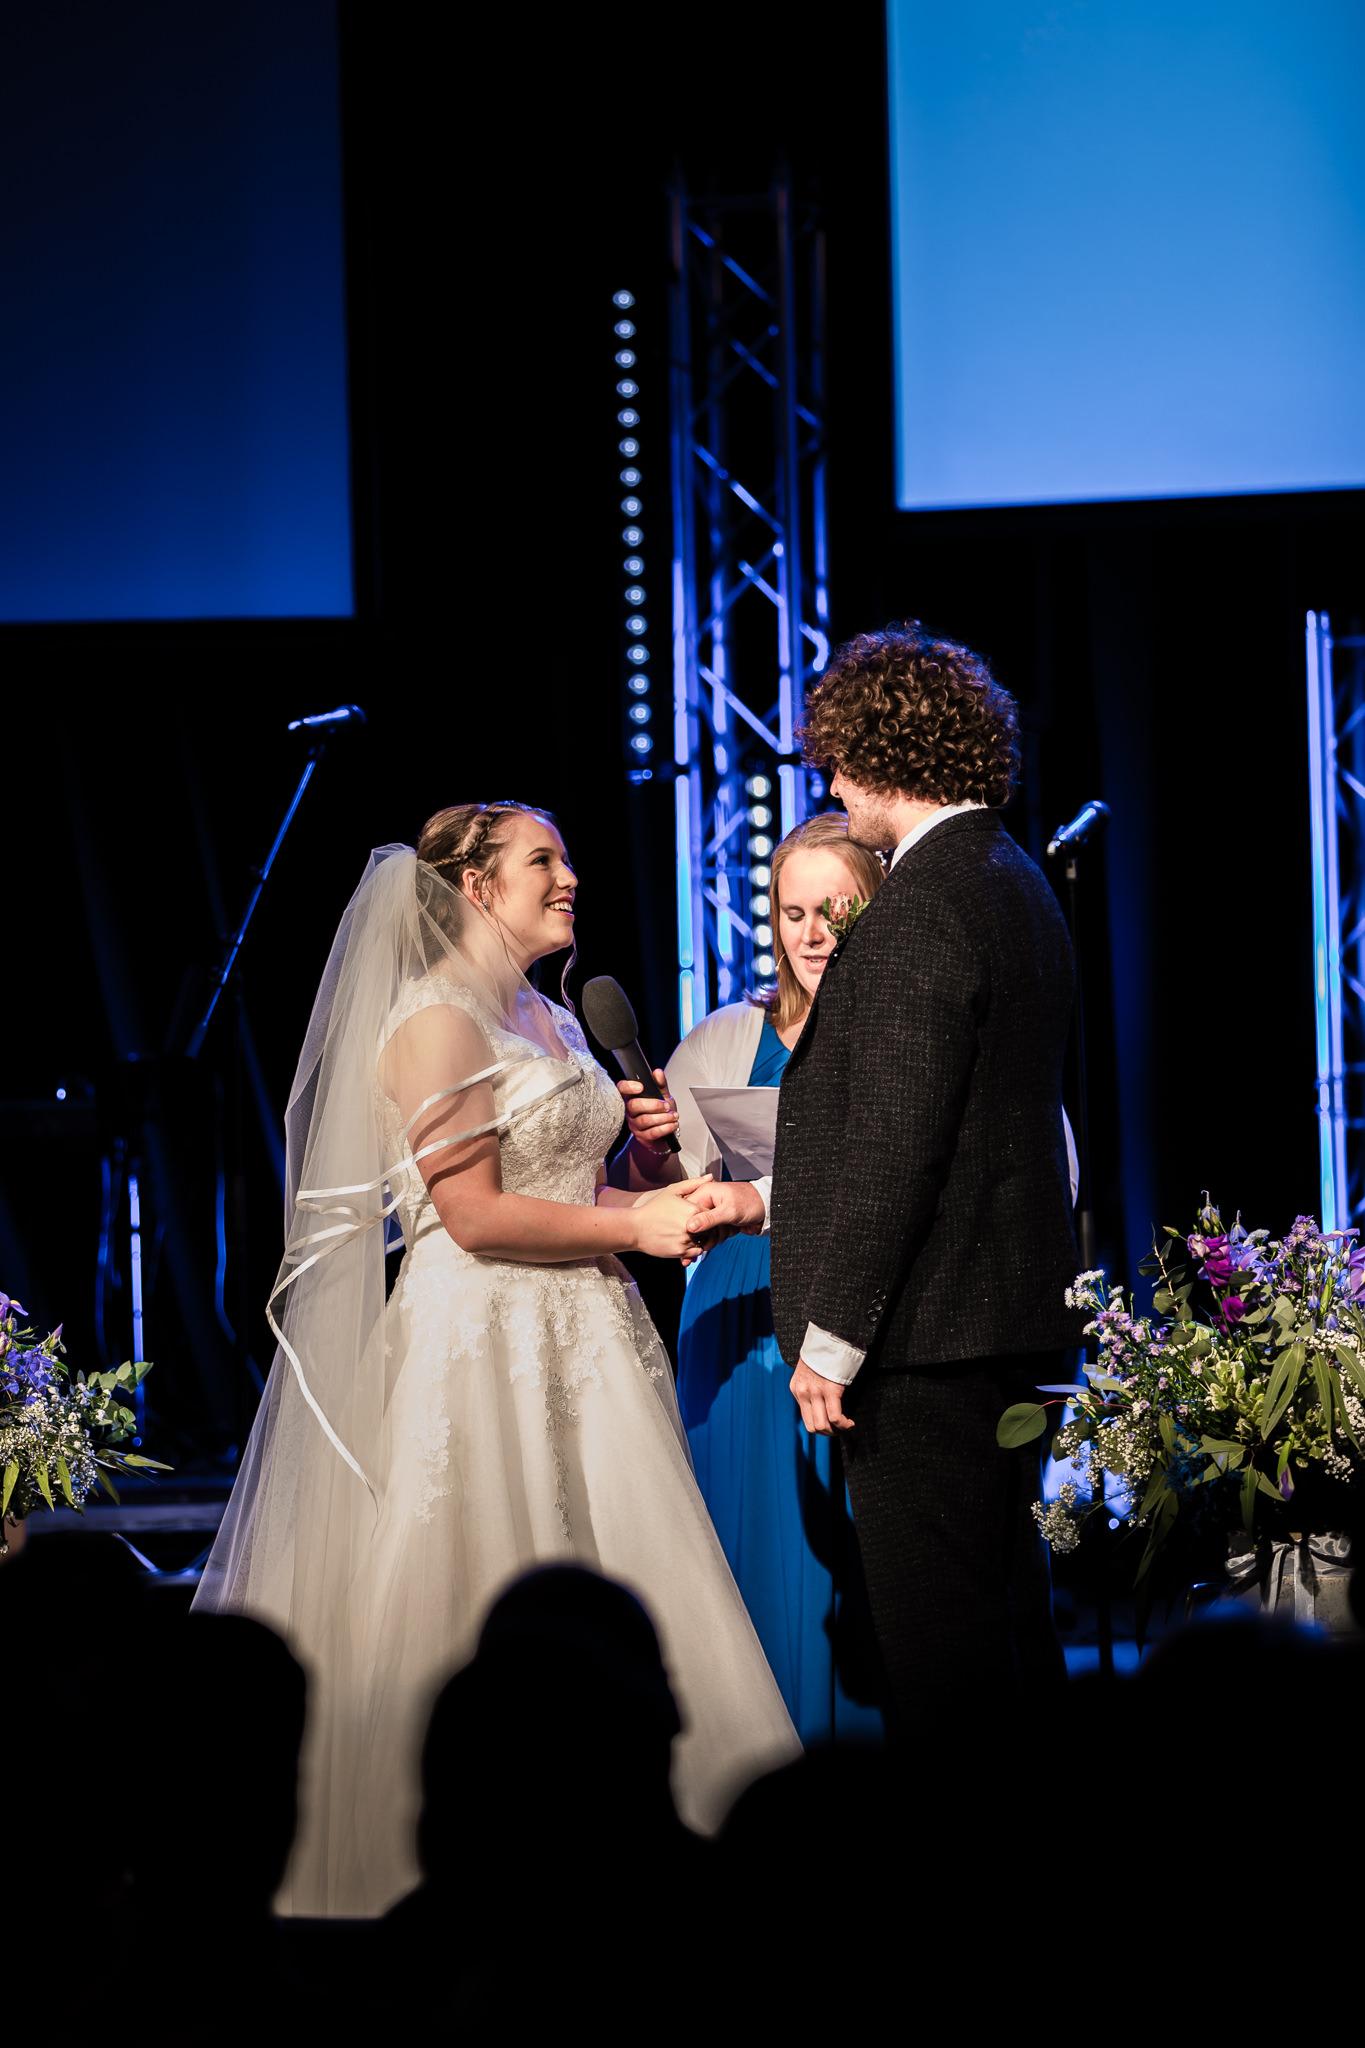 nottingham wedding24